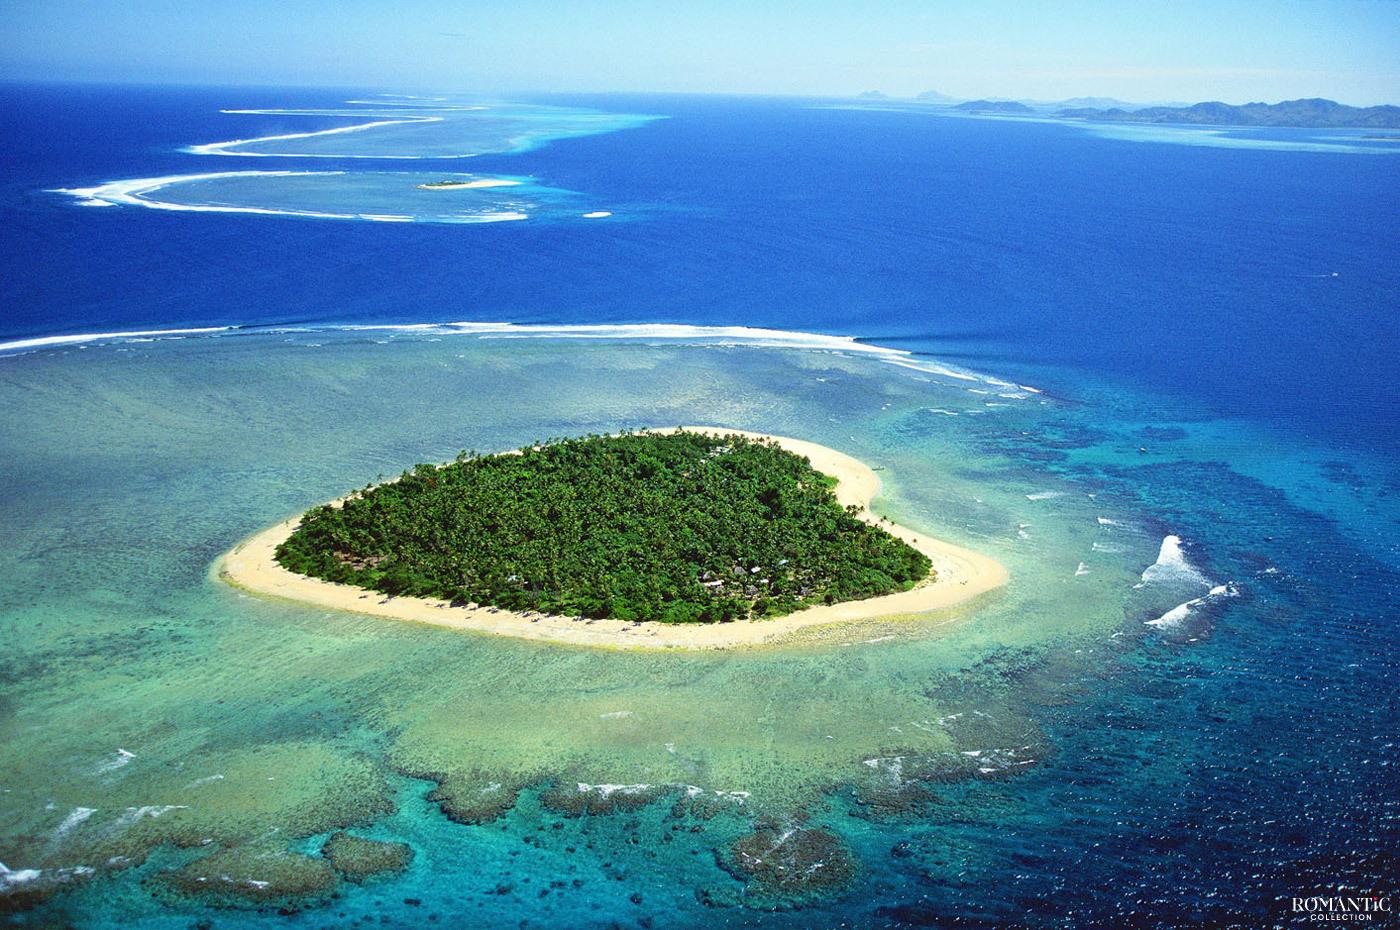 Остров Таваруа в Тихом океане